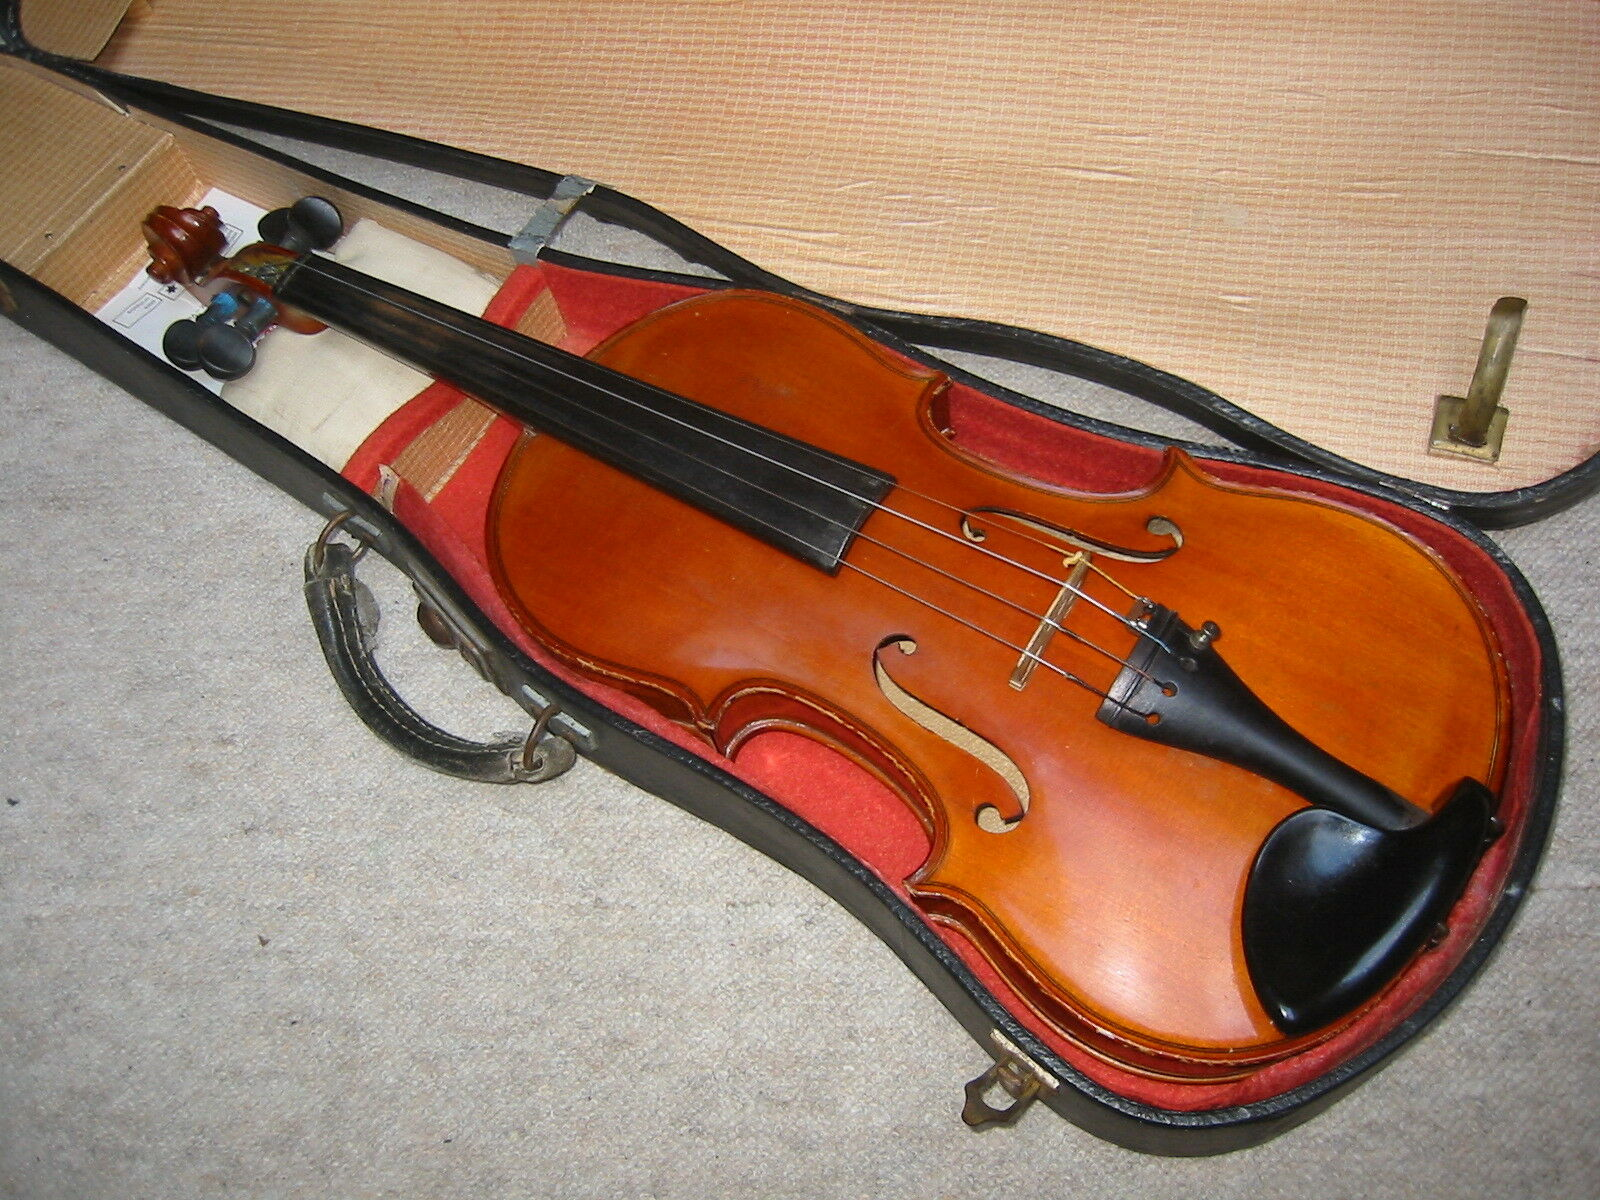 Interesante, Interesante, Interesante, agradable y antiguo violín 4 4 Violon 33f584